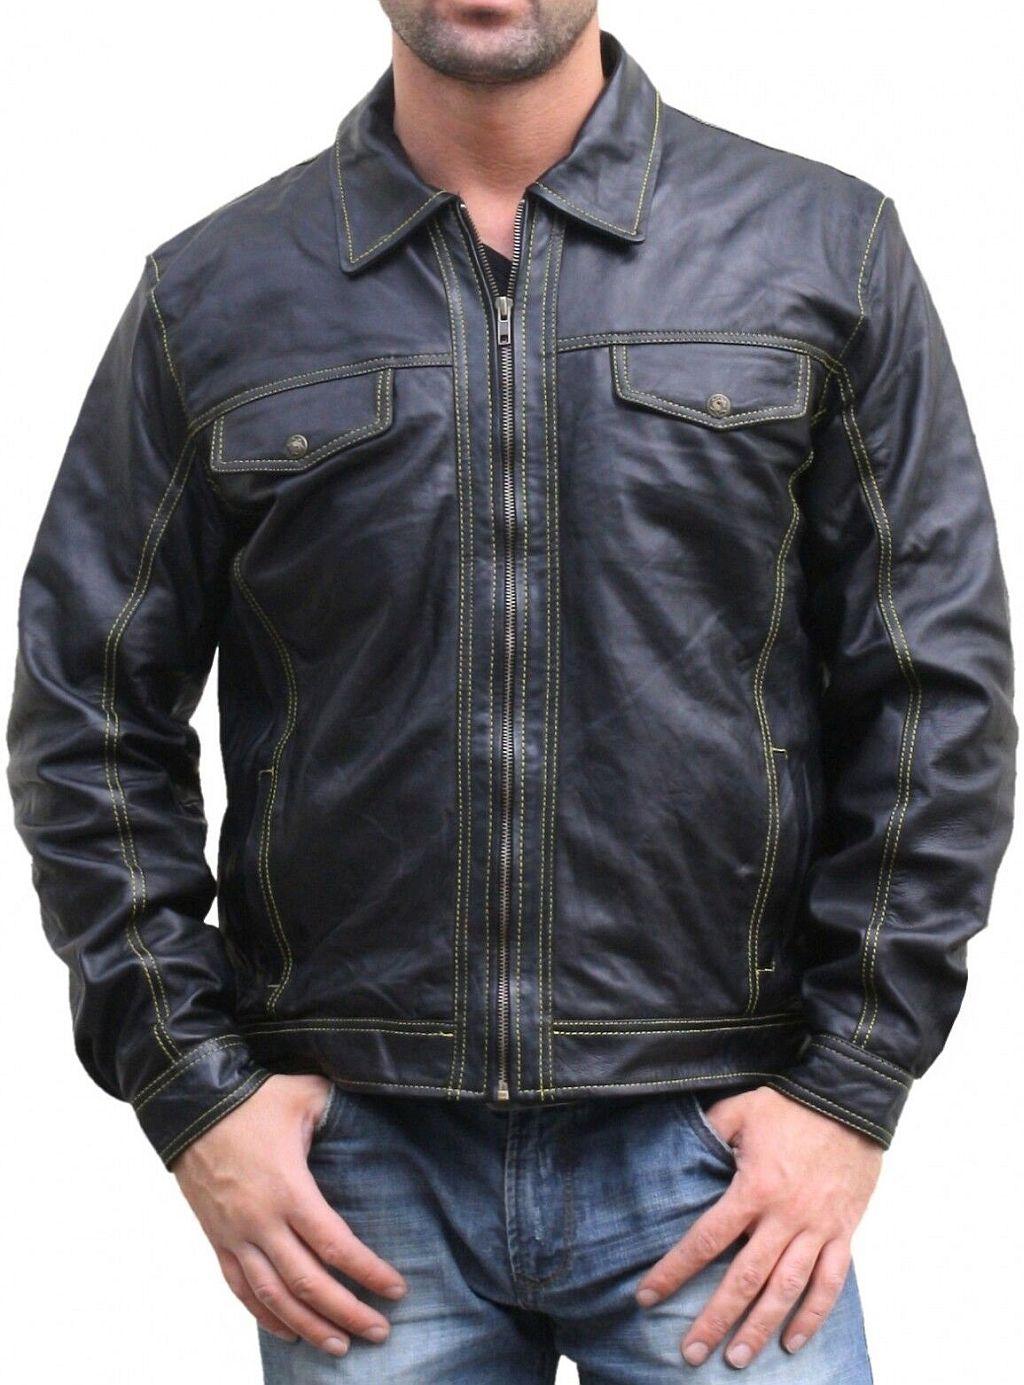 Lederjacke Jacke aus Lamm Nappa Leder Schwarz 48 - 60 / M - 5 XL